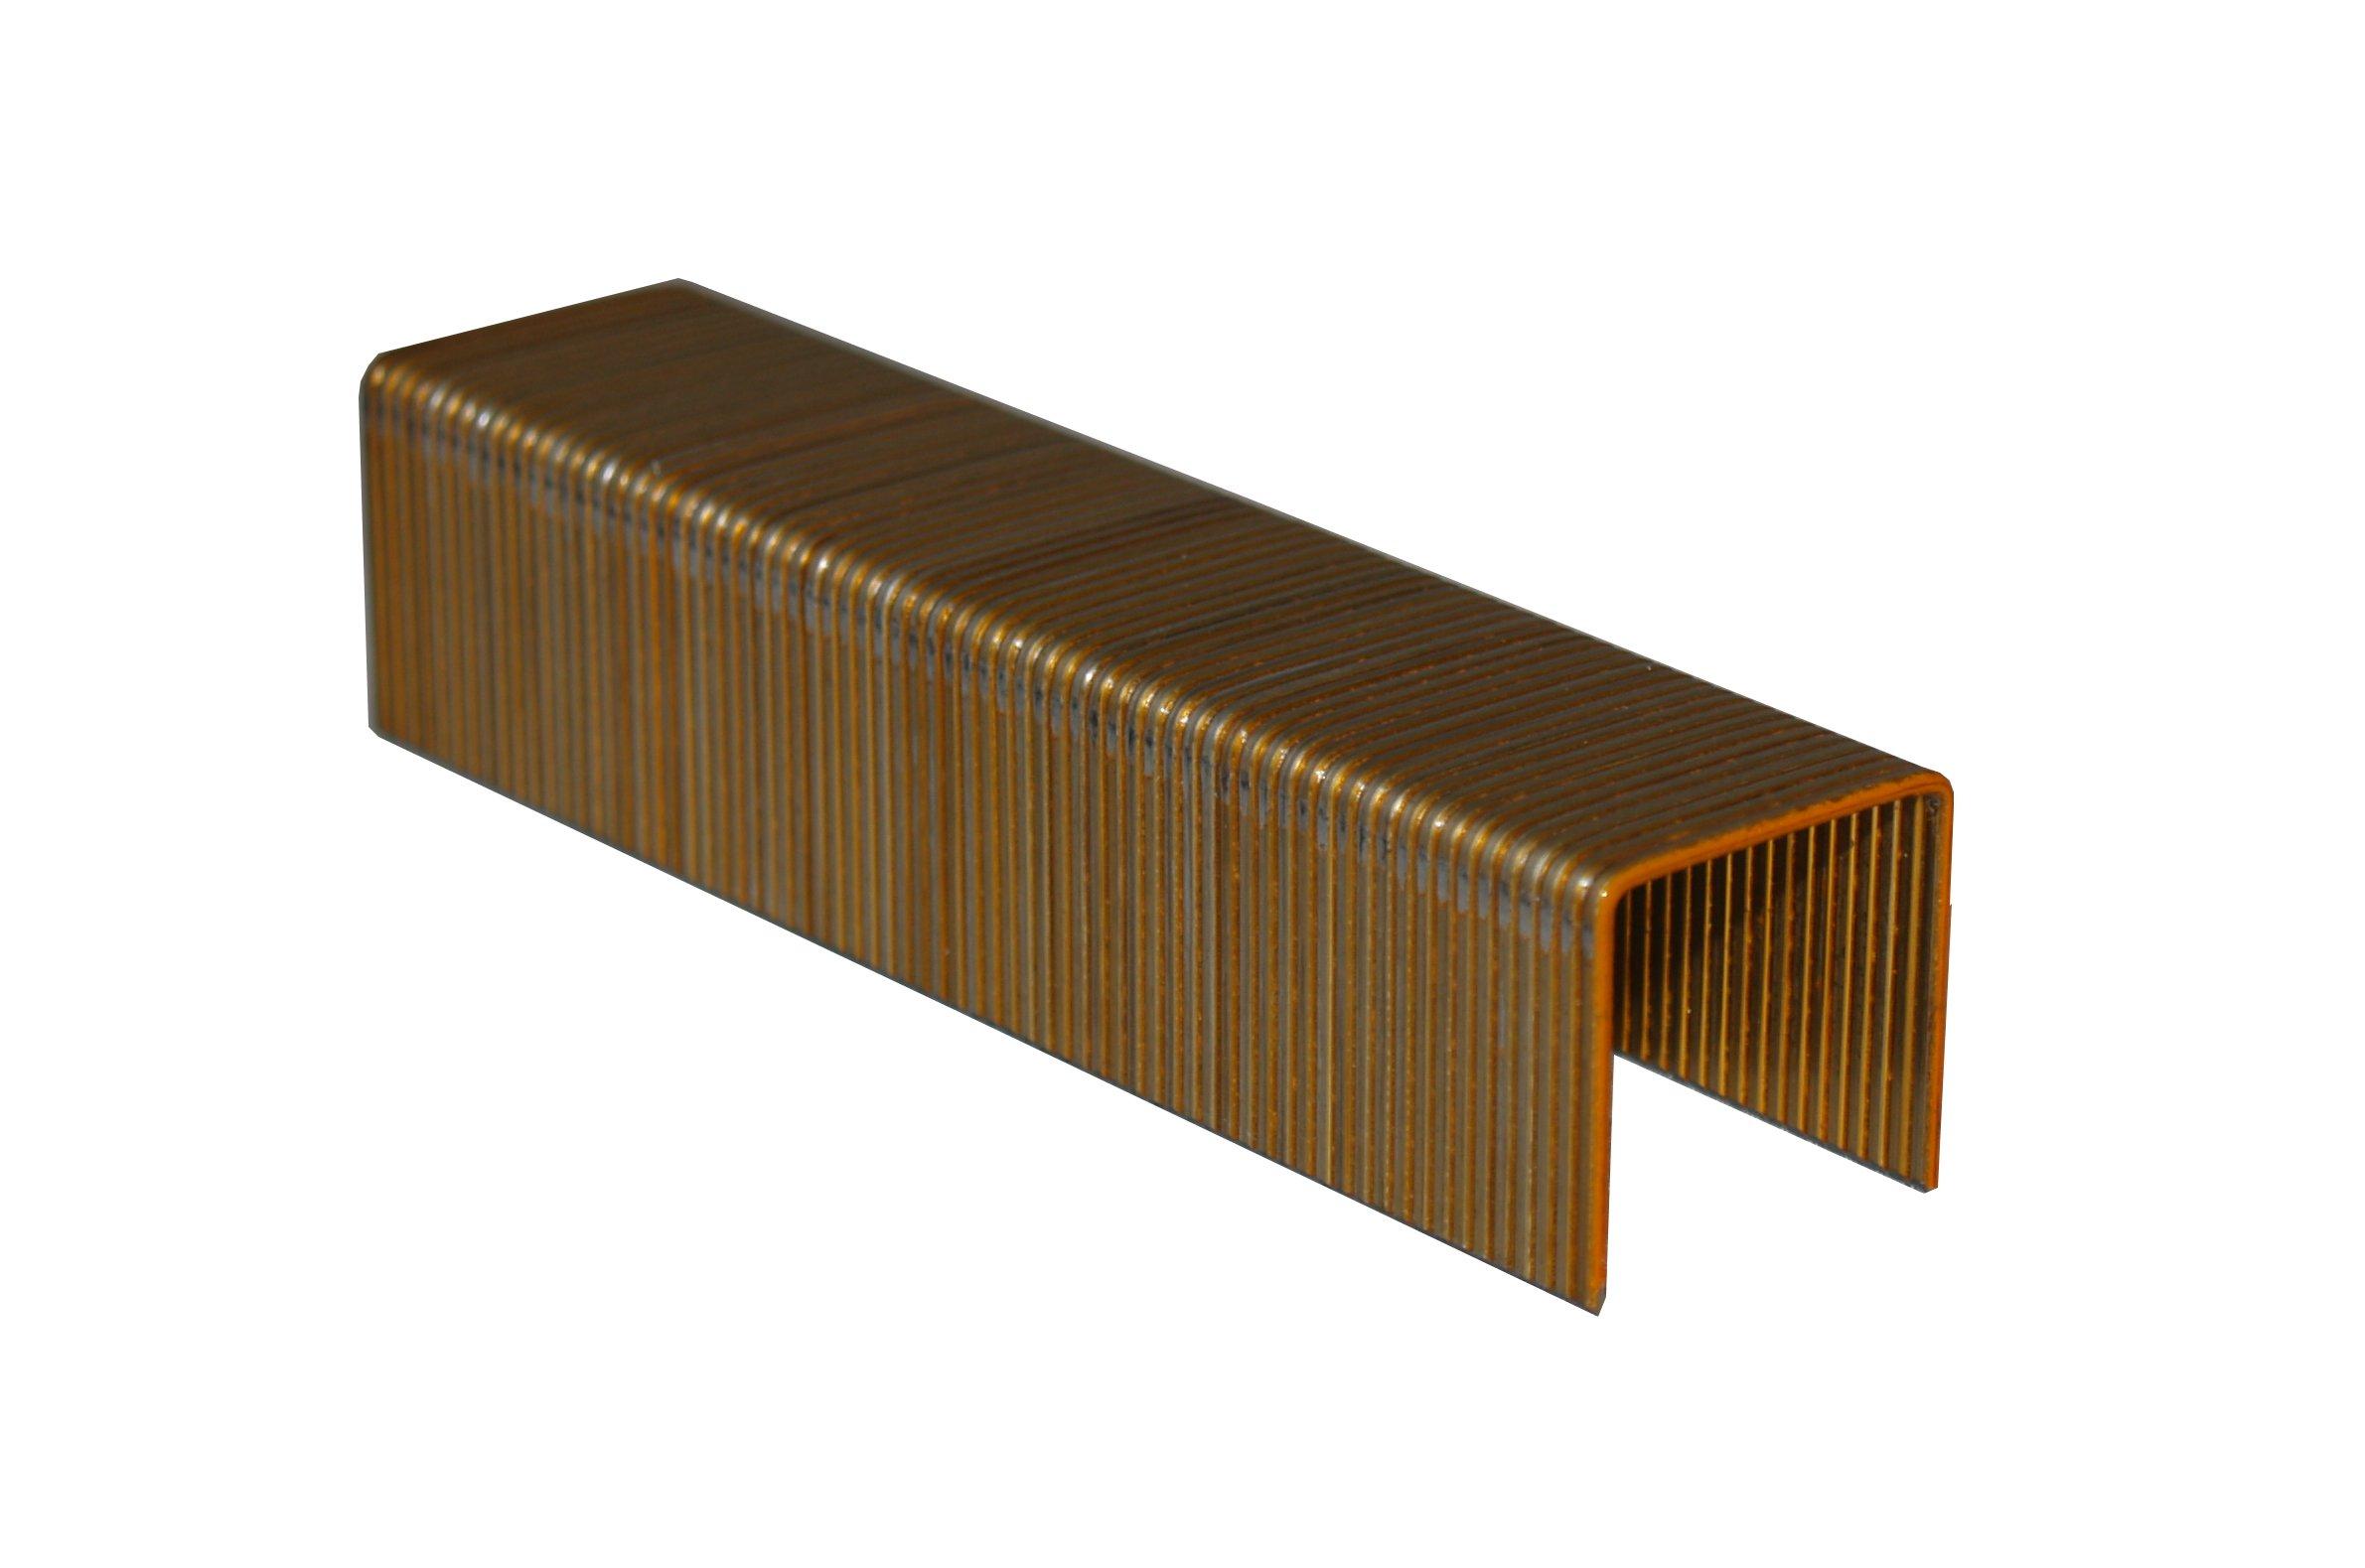 Spot Nails 3608PG-10M 1-Inch 16-Gauge Galvanized Wide Crown Senco-Hitachi Style Staples, 10000-Count, 1-Inch Leg by Spot Nails